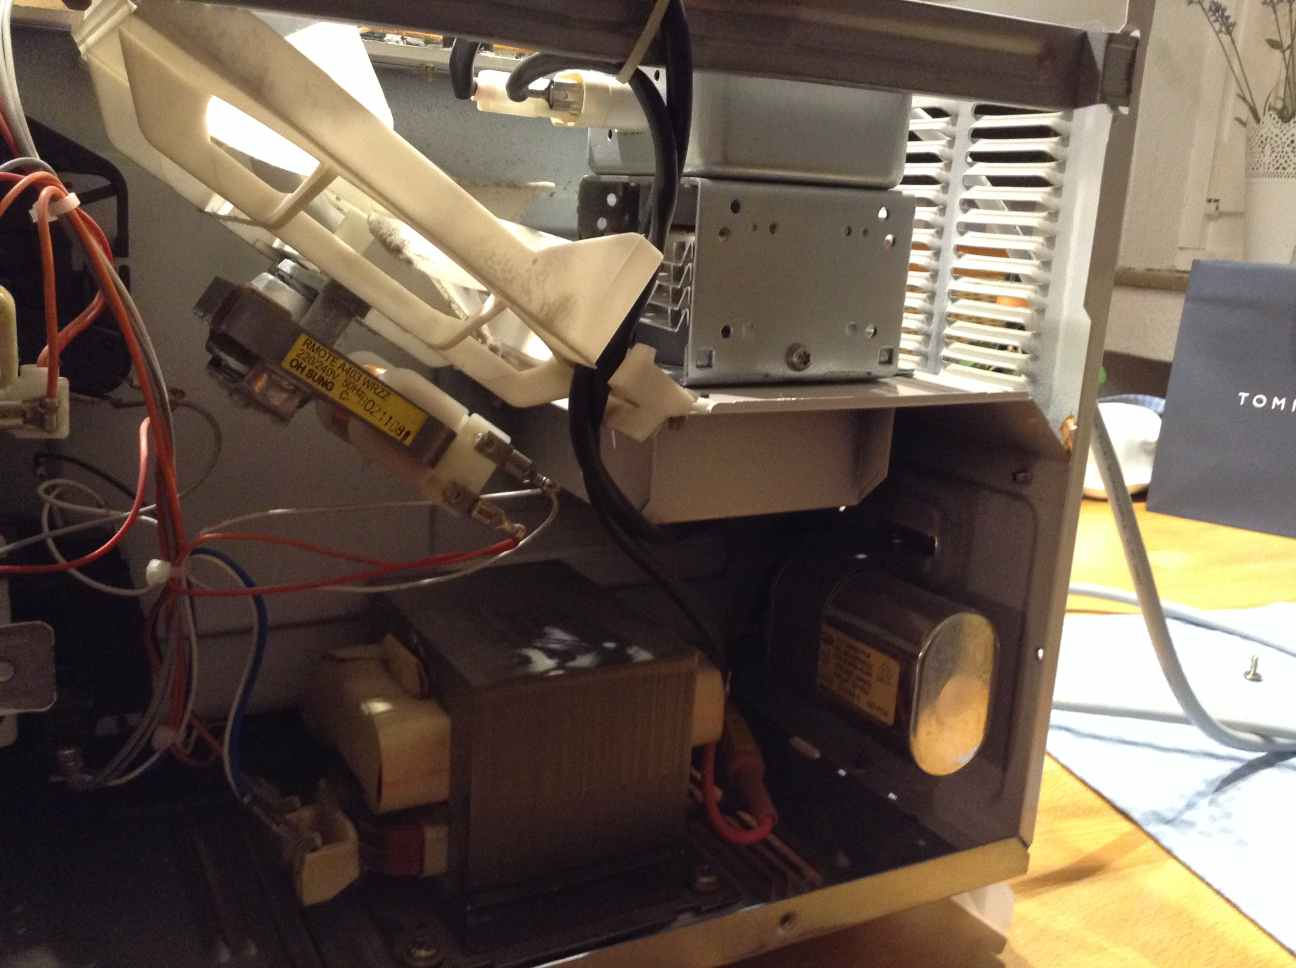 küchen)mikrowelle: trafo defekt? - mikrocontroller